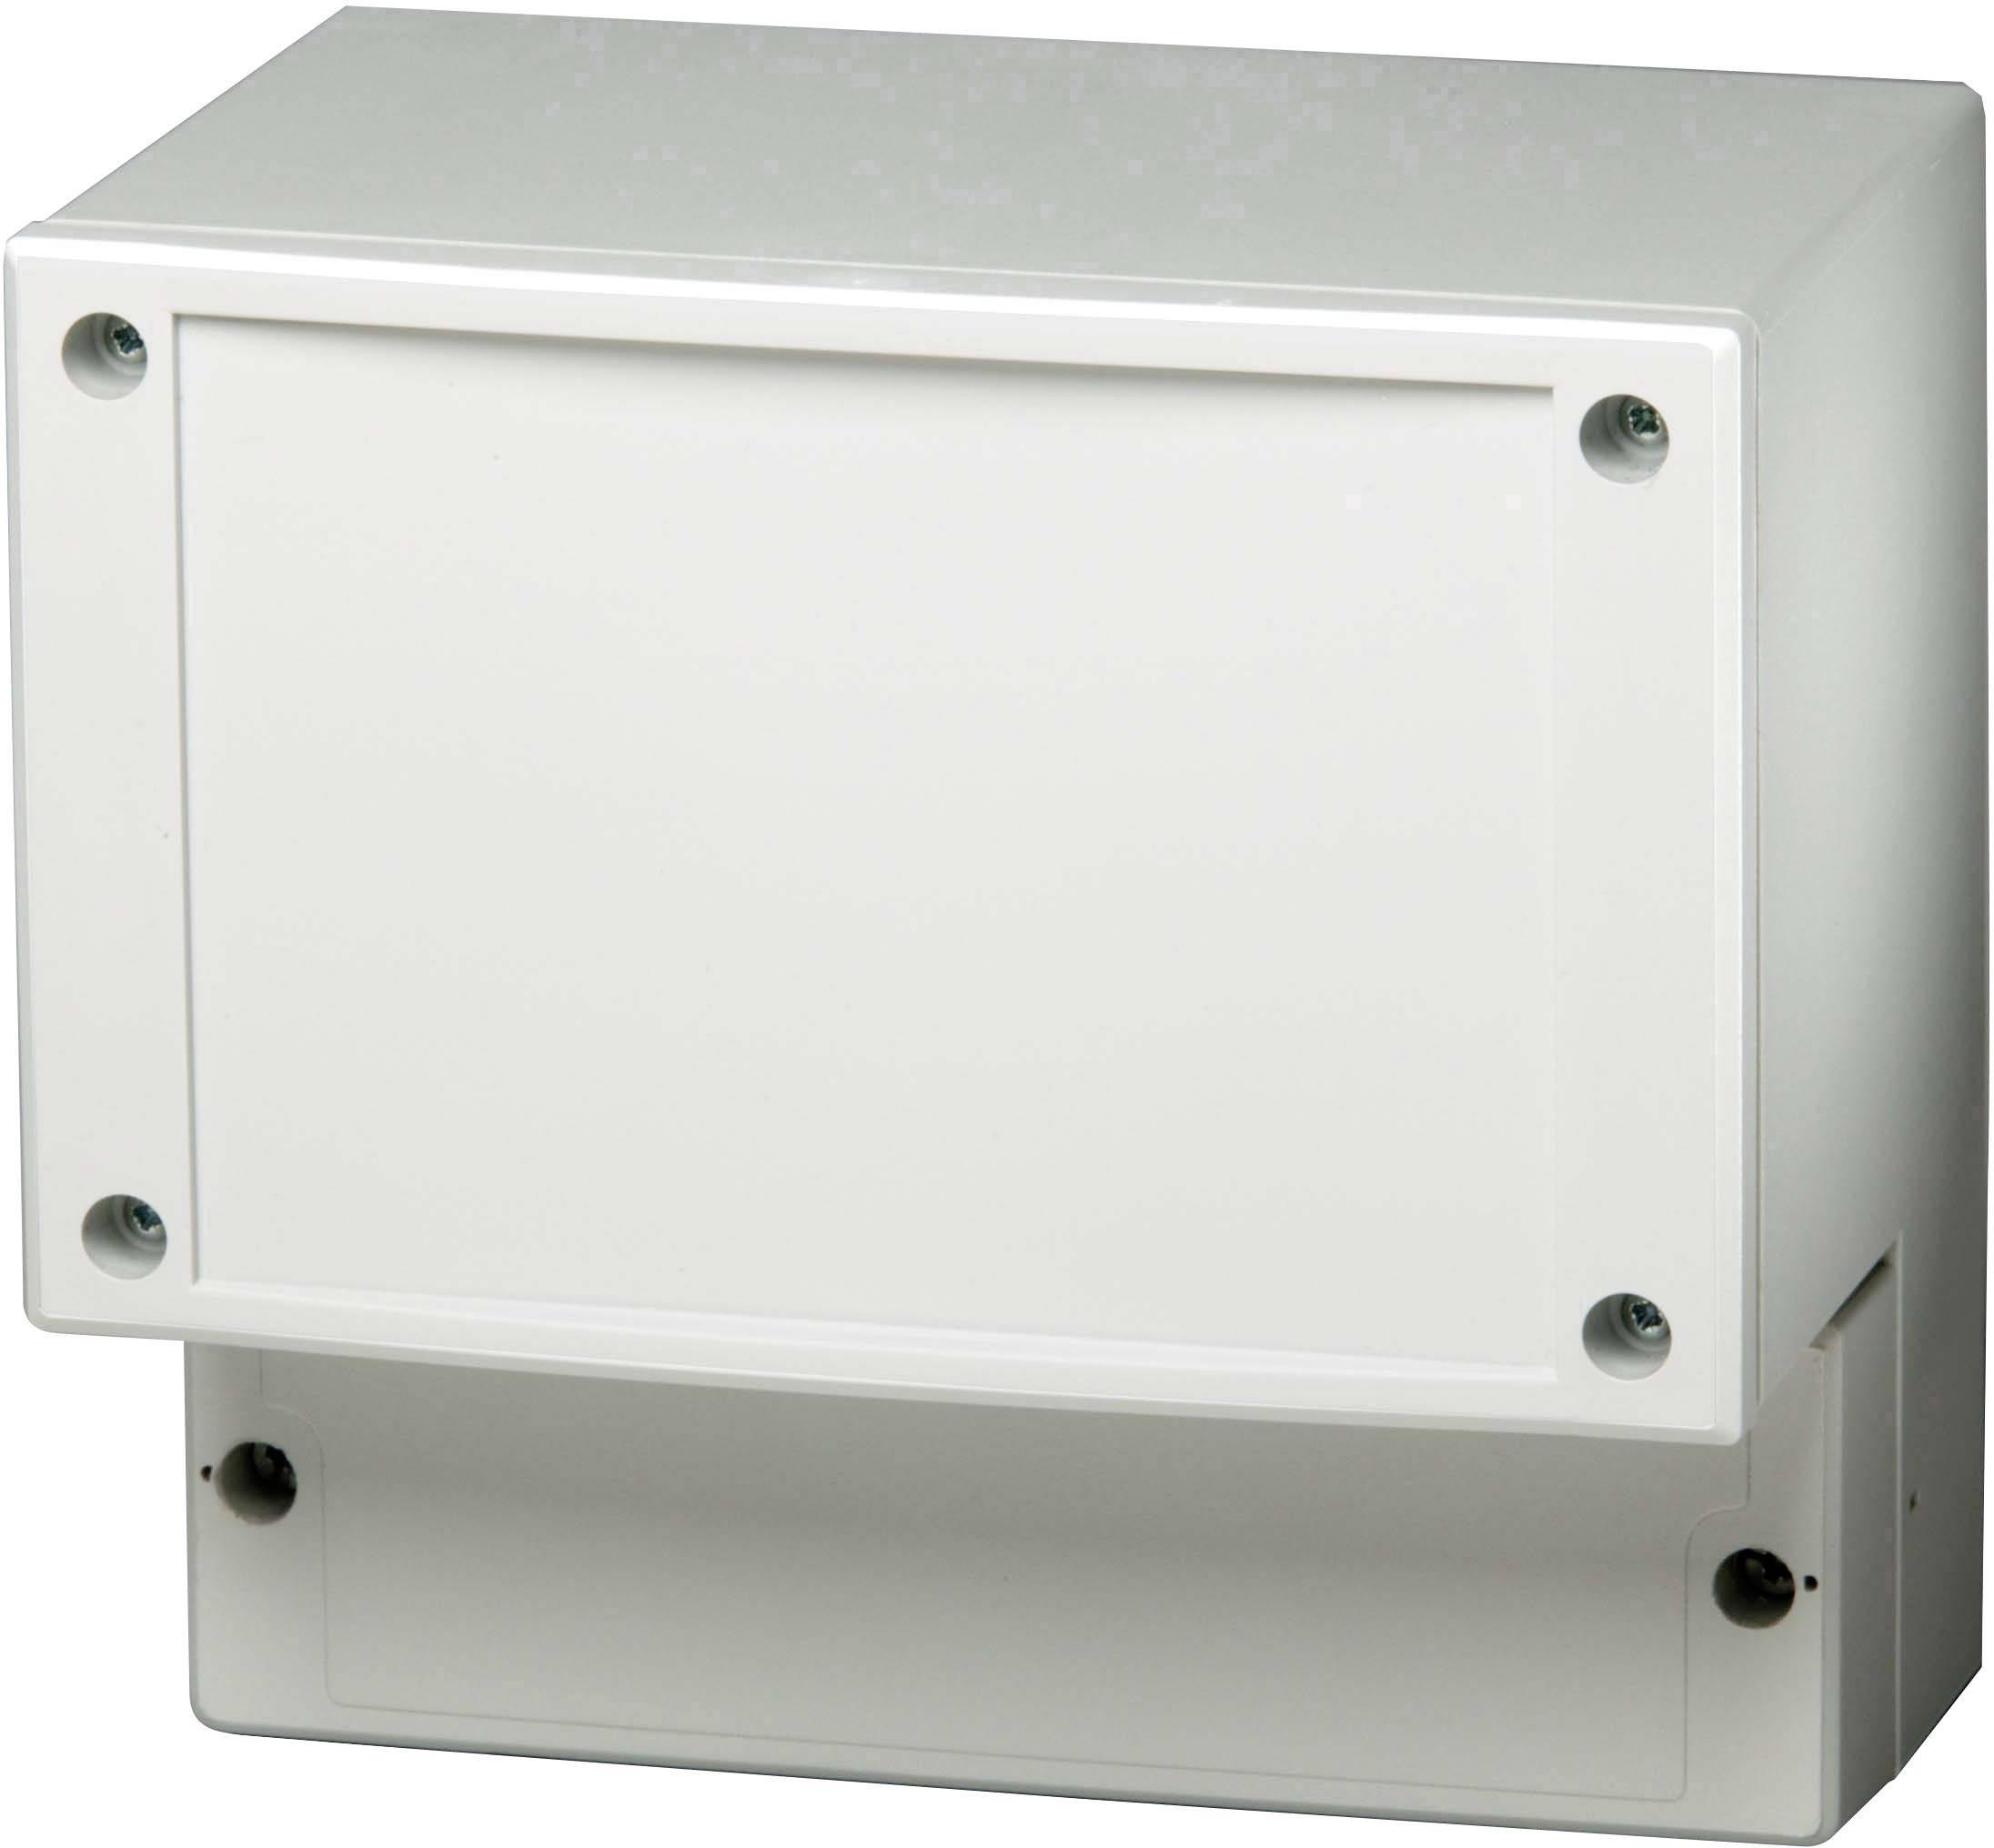 Krabička na regulátor Fibox CARDMASTER PC 17/16-LFC3, (š x v x h) 160 x 166 x 85 mm, polykarbonát, šedá, 1 ks